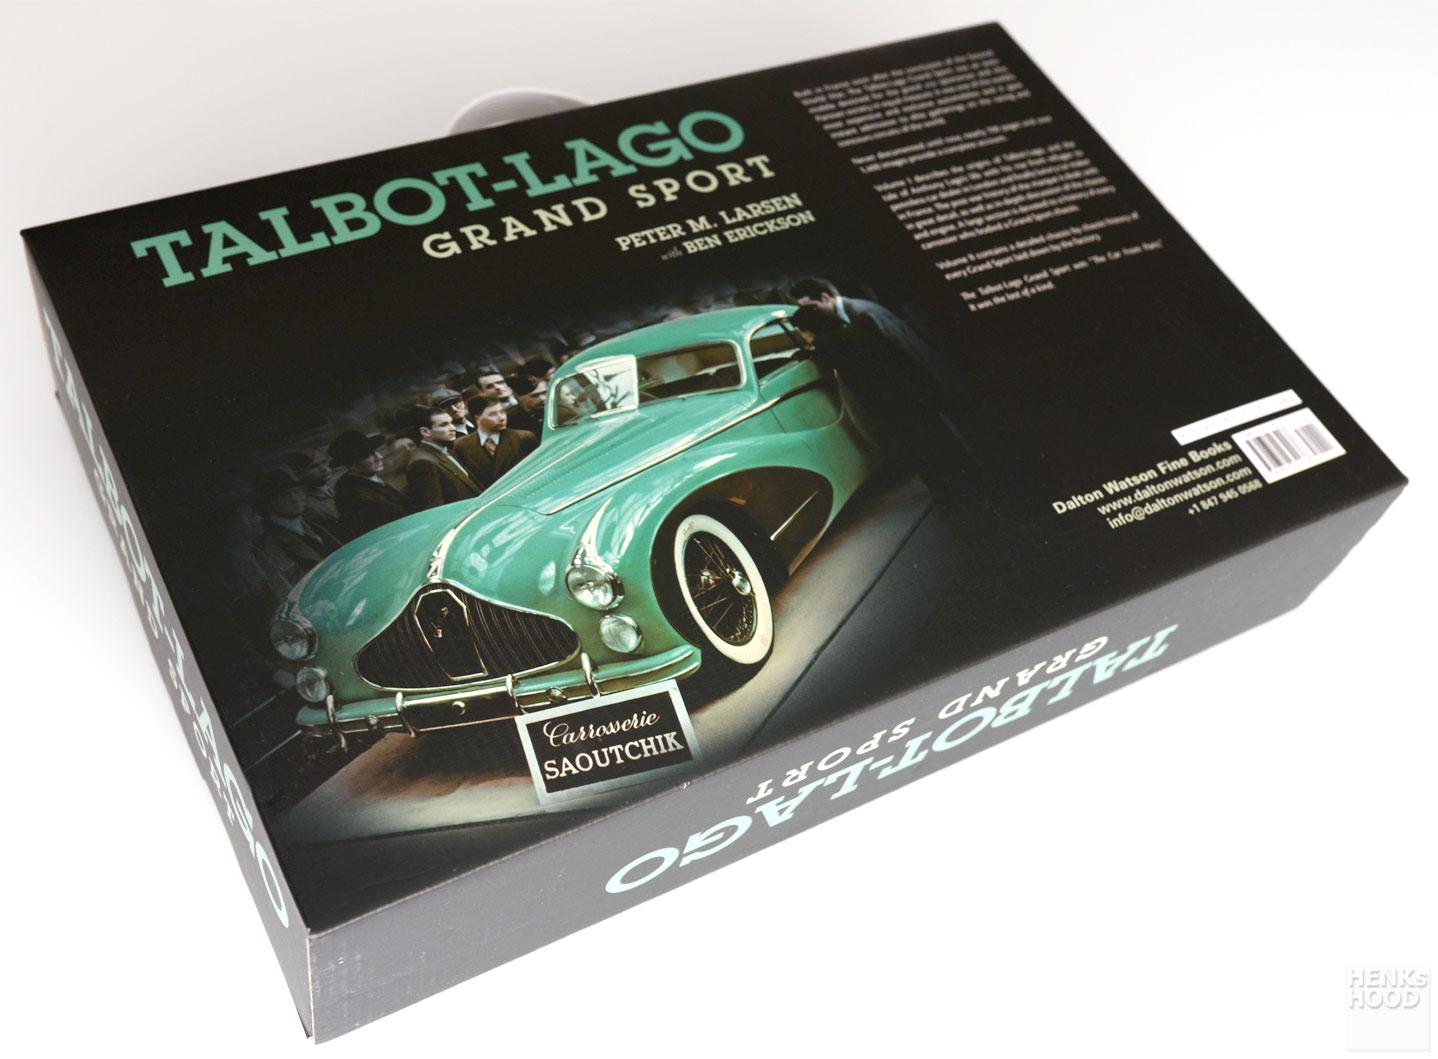 TalbotLago0000